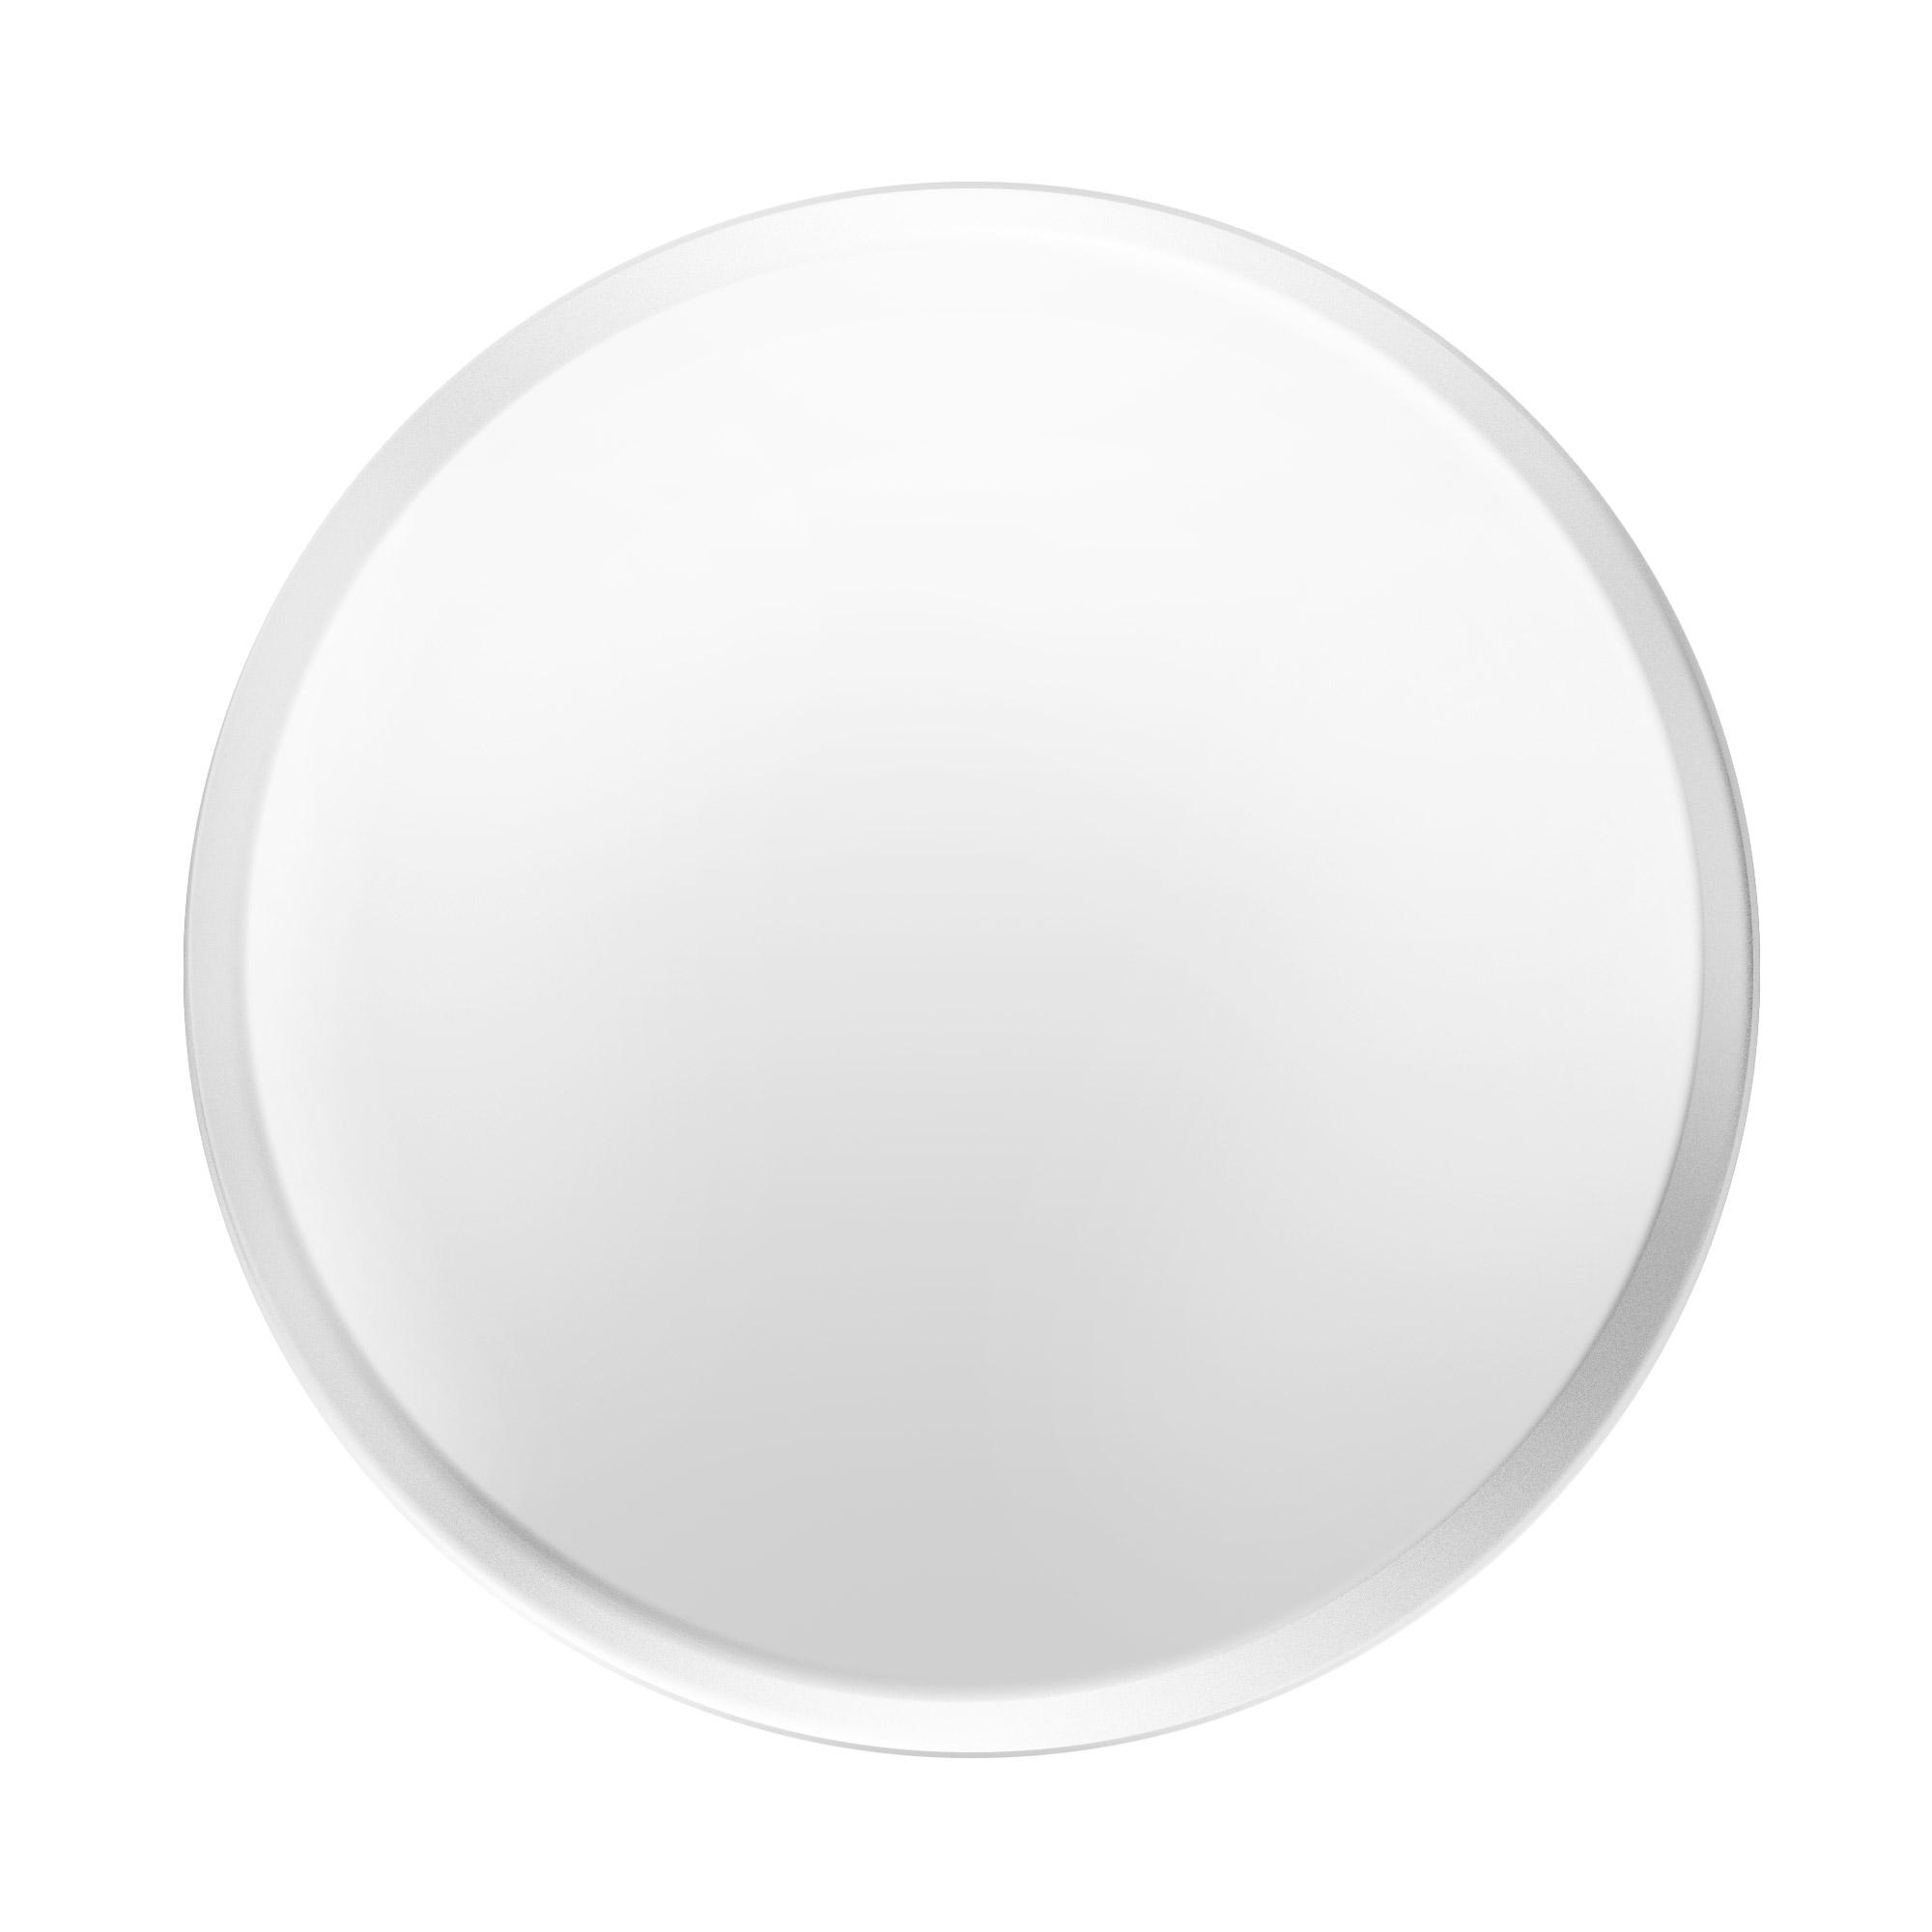 Купить Тарелка декоративная Sandra rich mirror д25см, белый, стекло